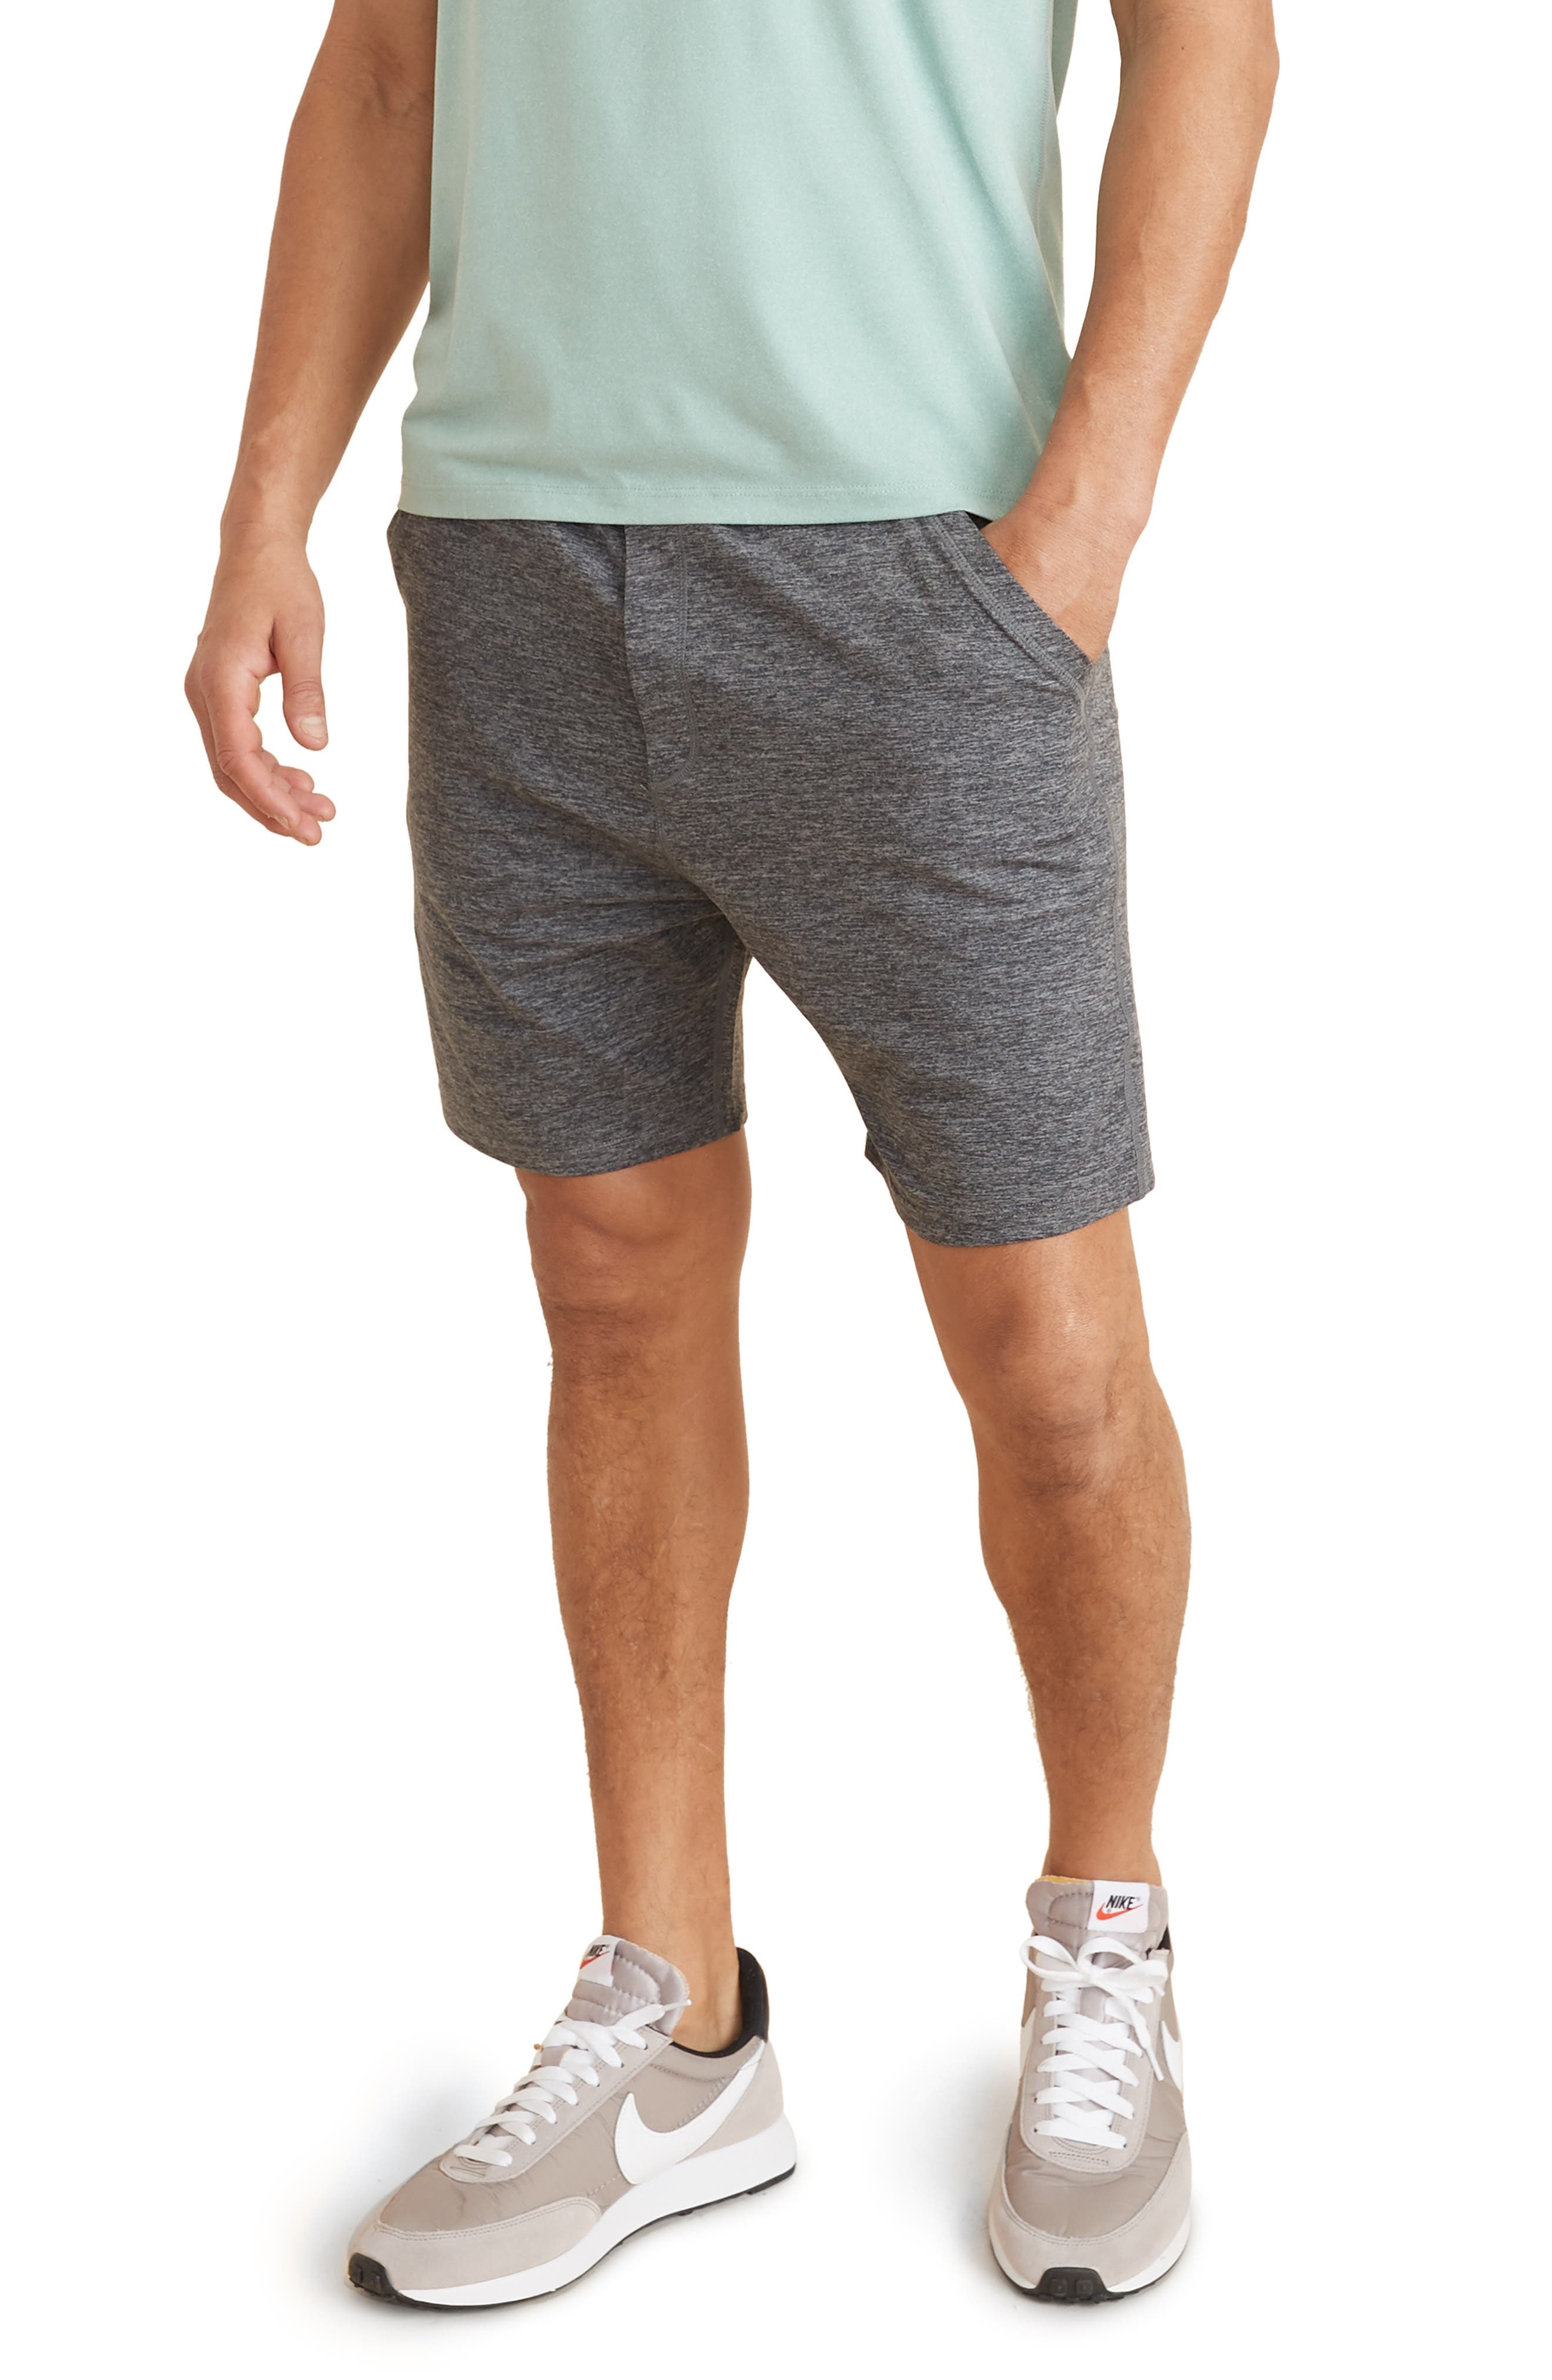 Pocket Yoga Shorts